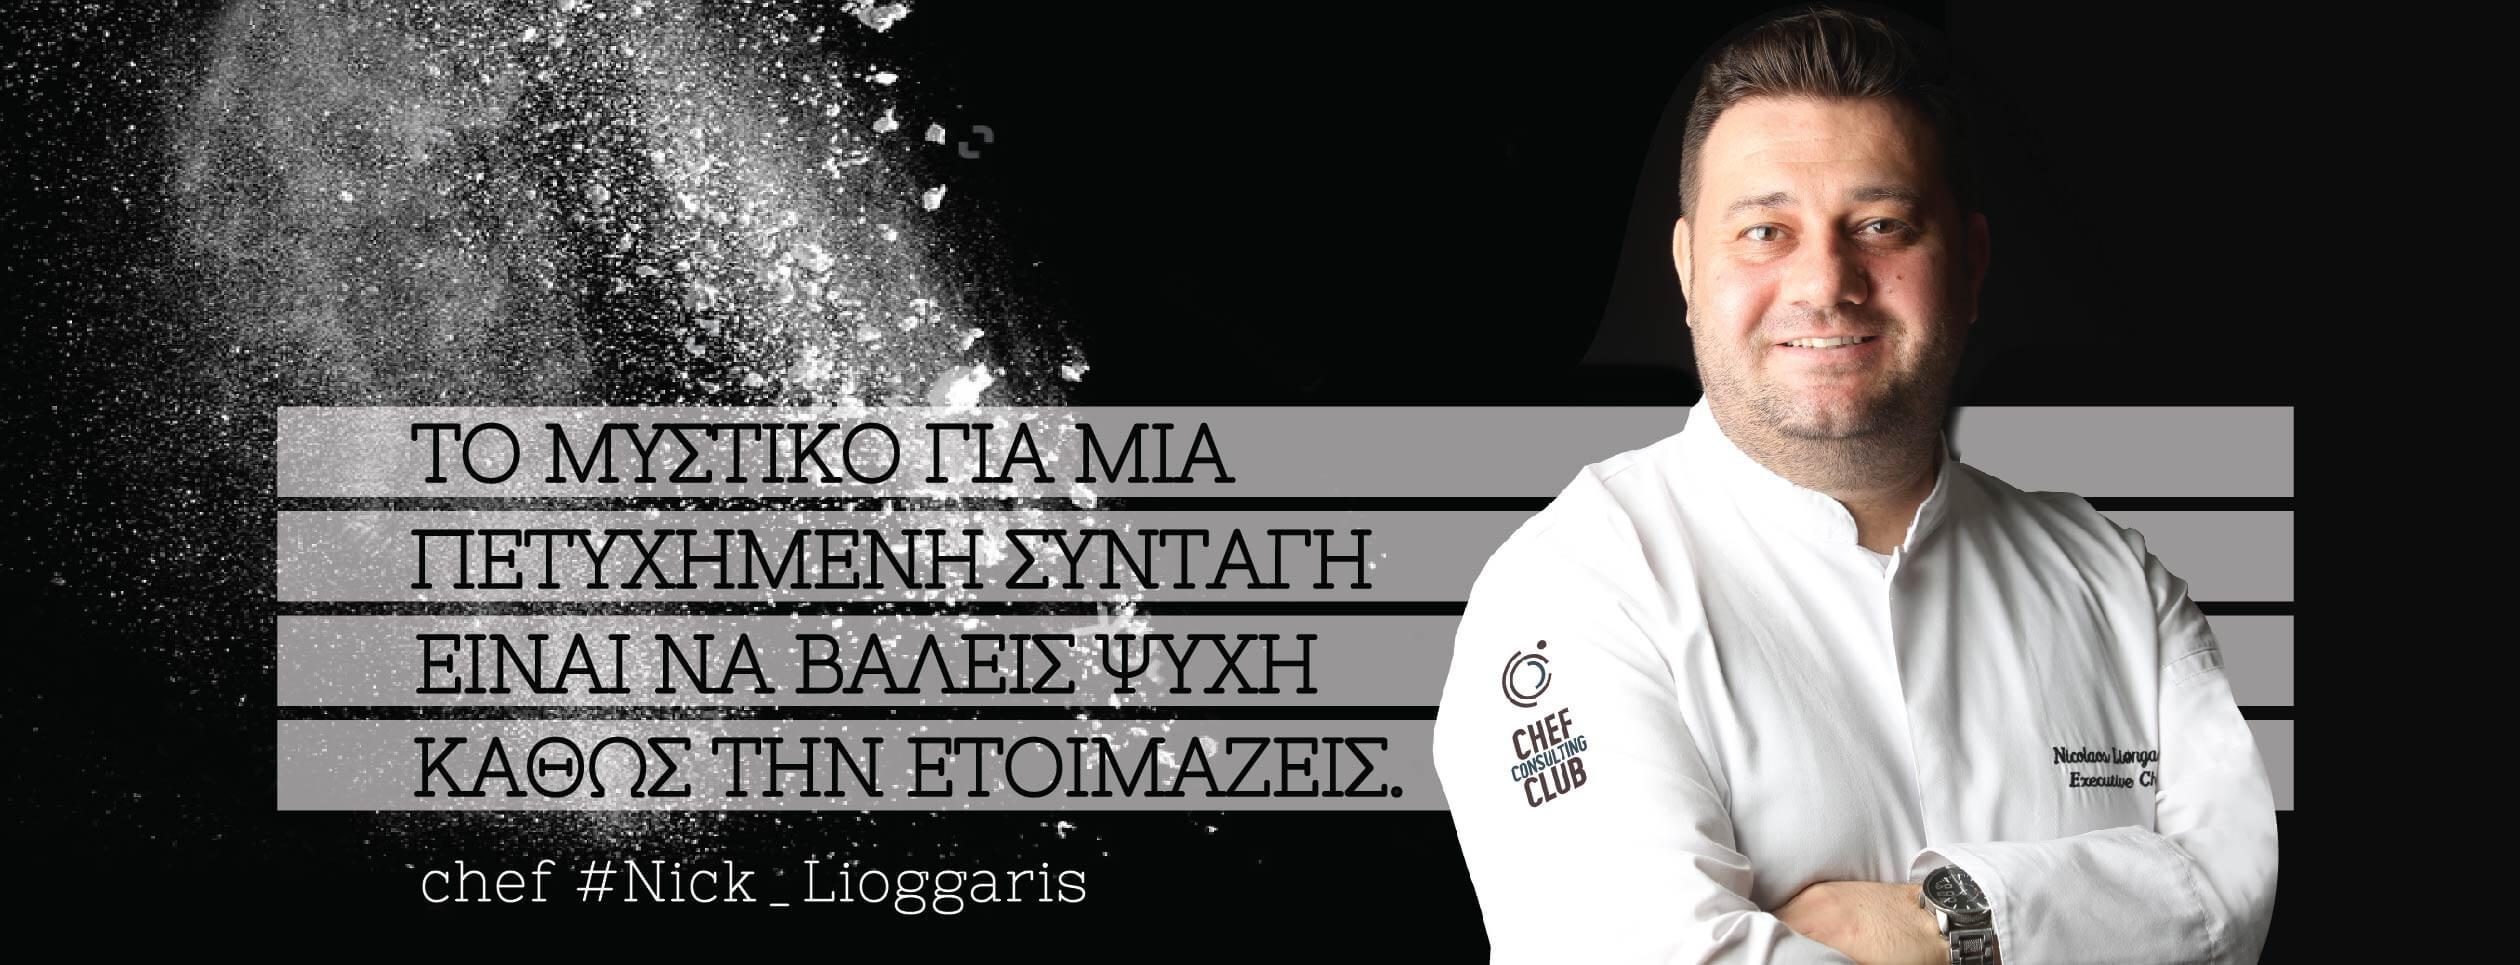 LIOGGARIS FB-02